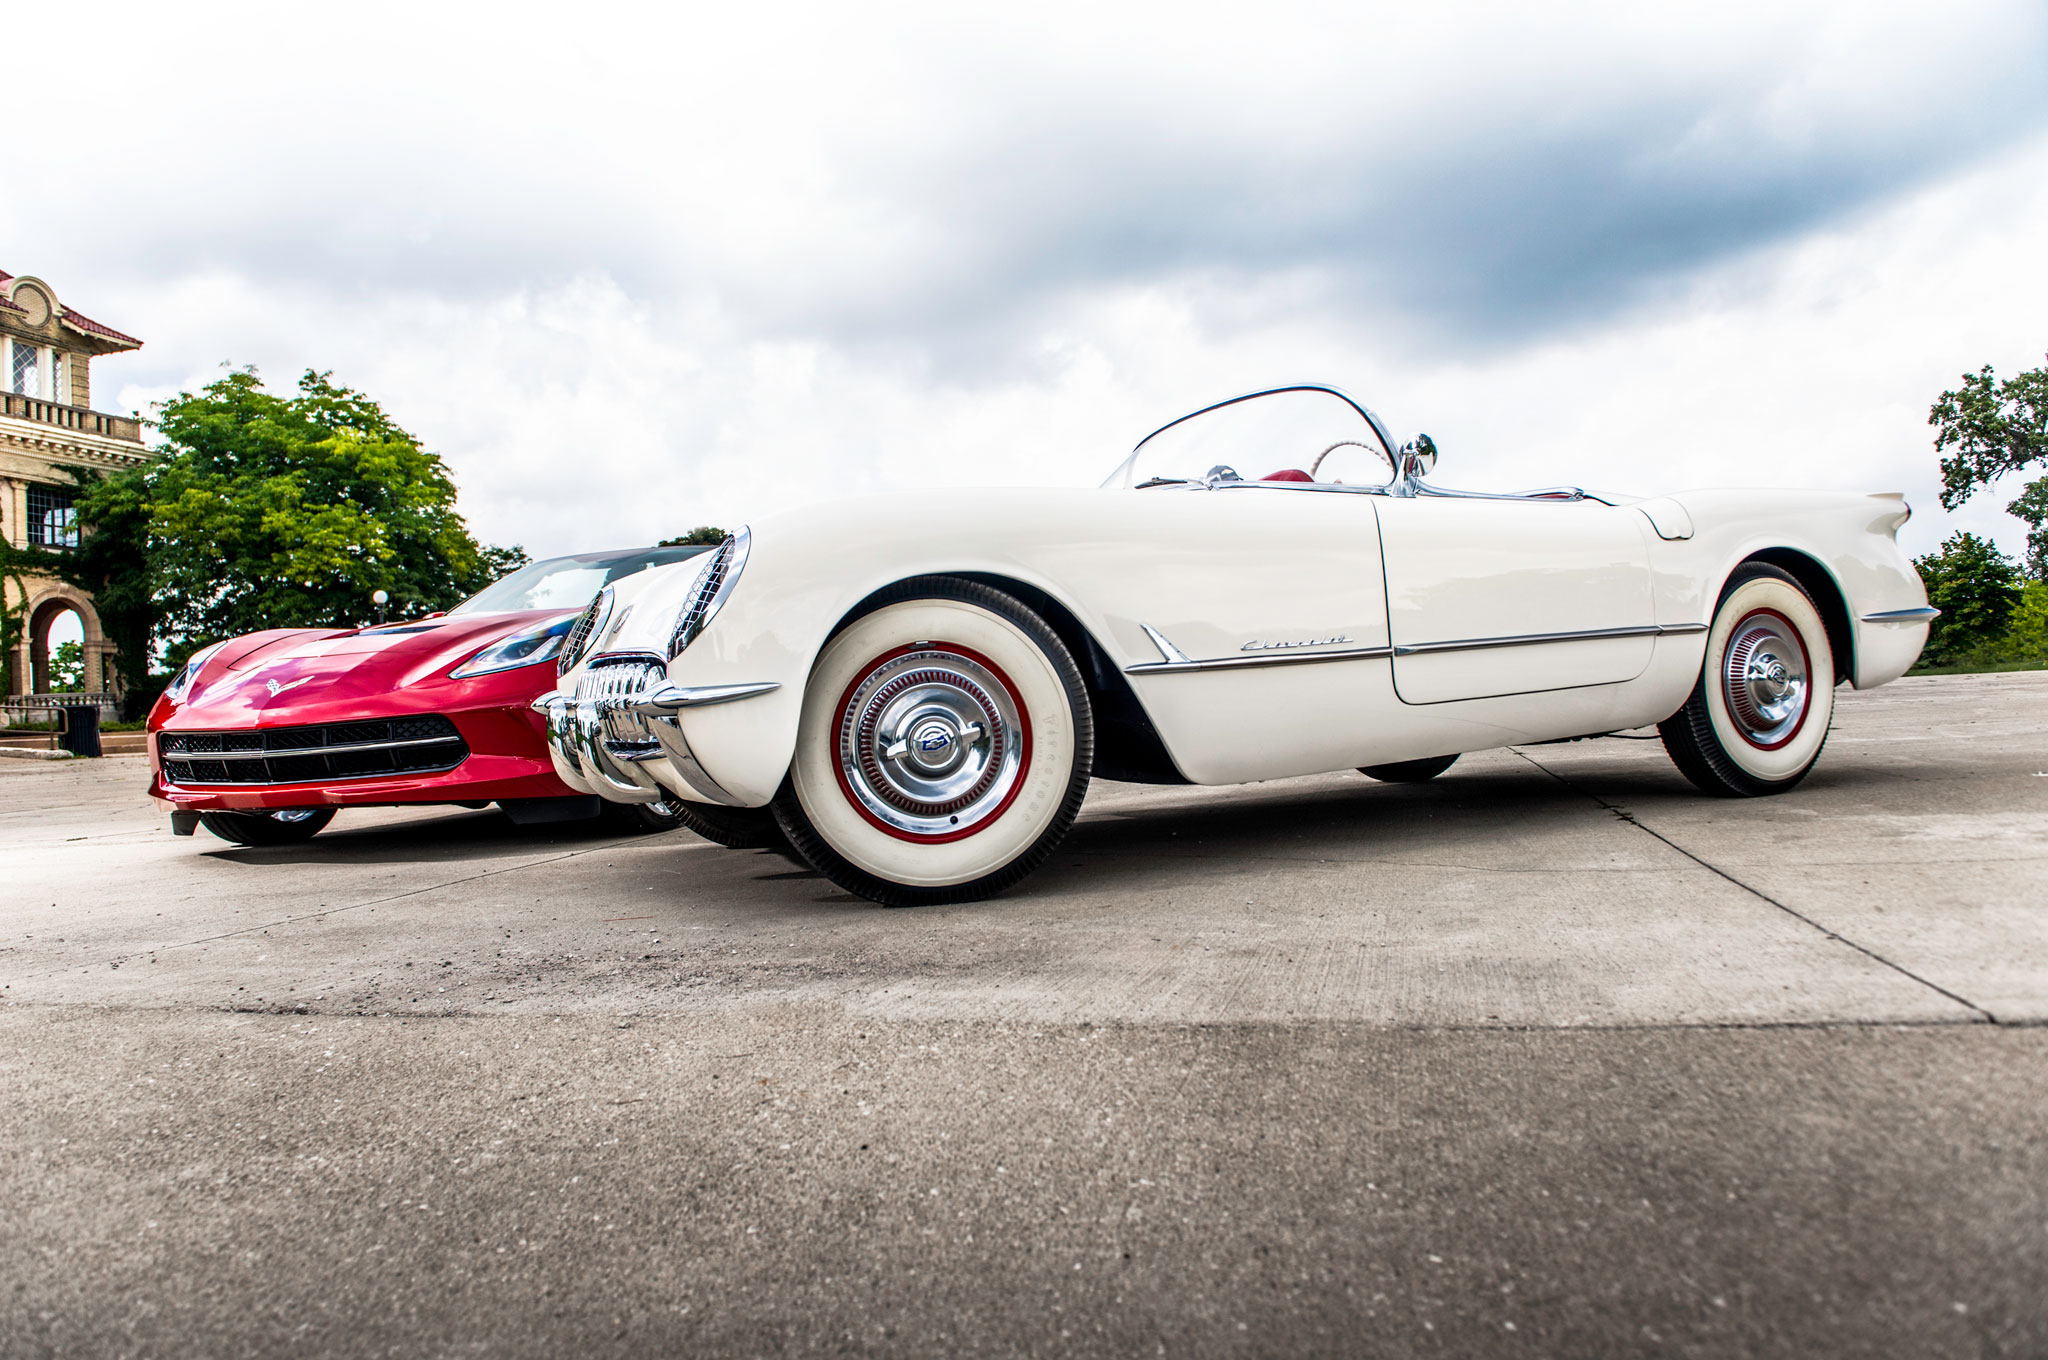 then vs now 2015 chevrolet corvette vs 1954 chevrolet corvette 1954 Corvette ZR1 show more